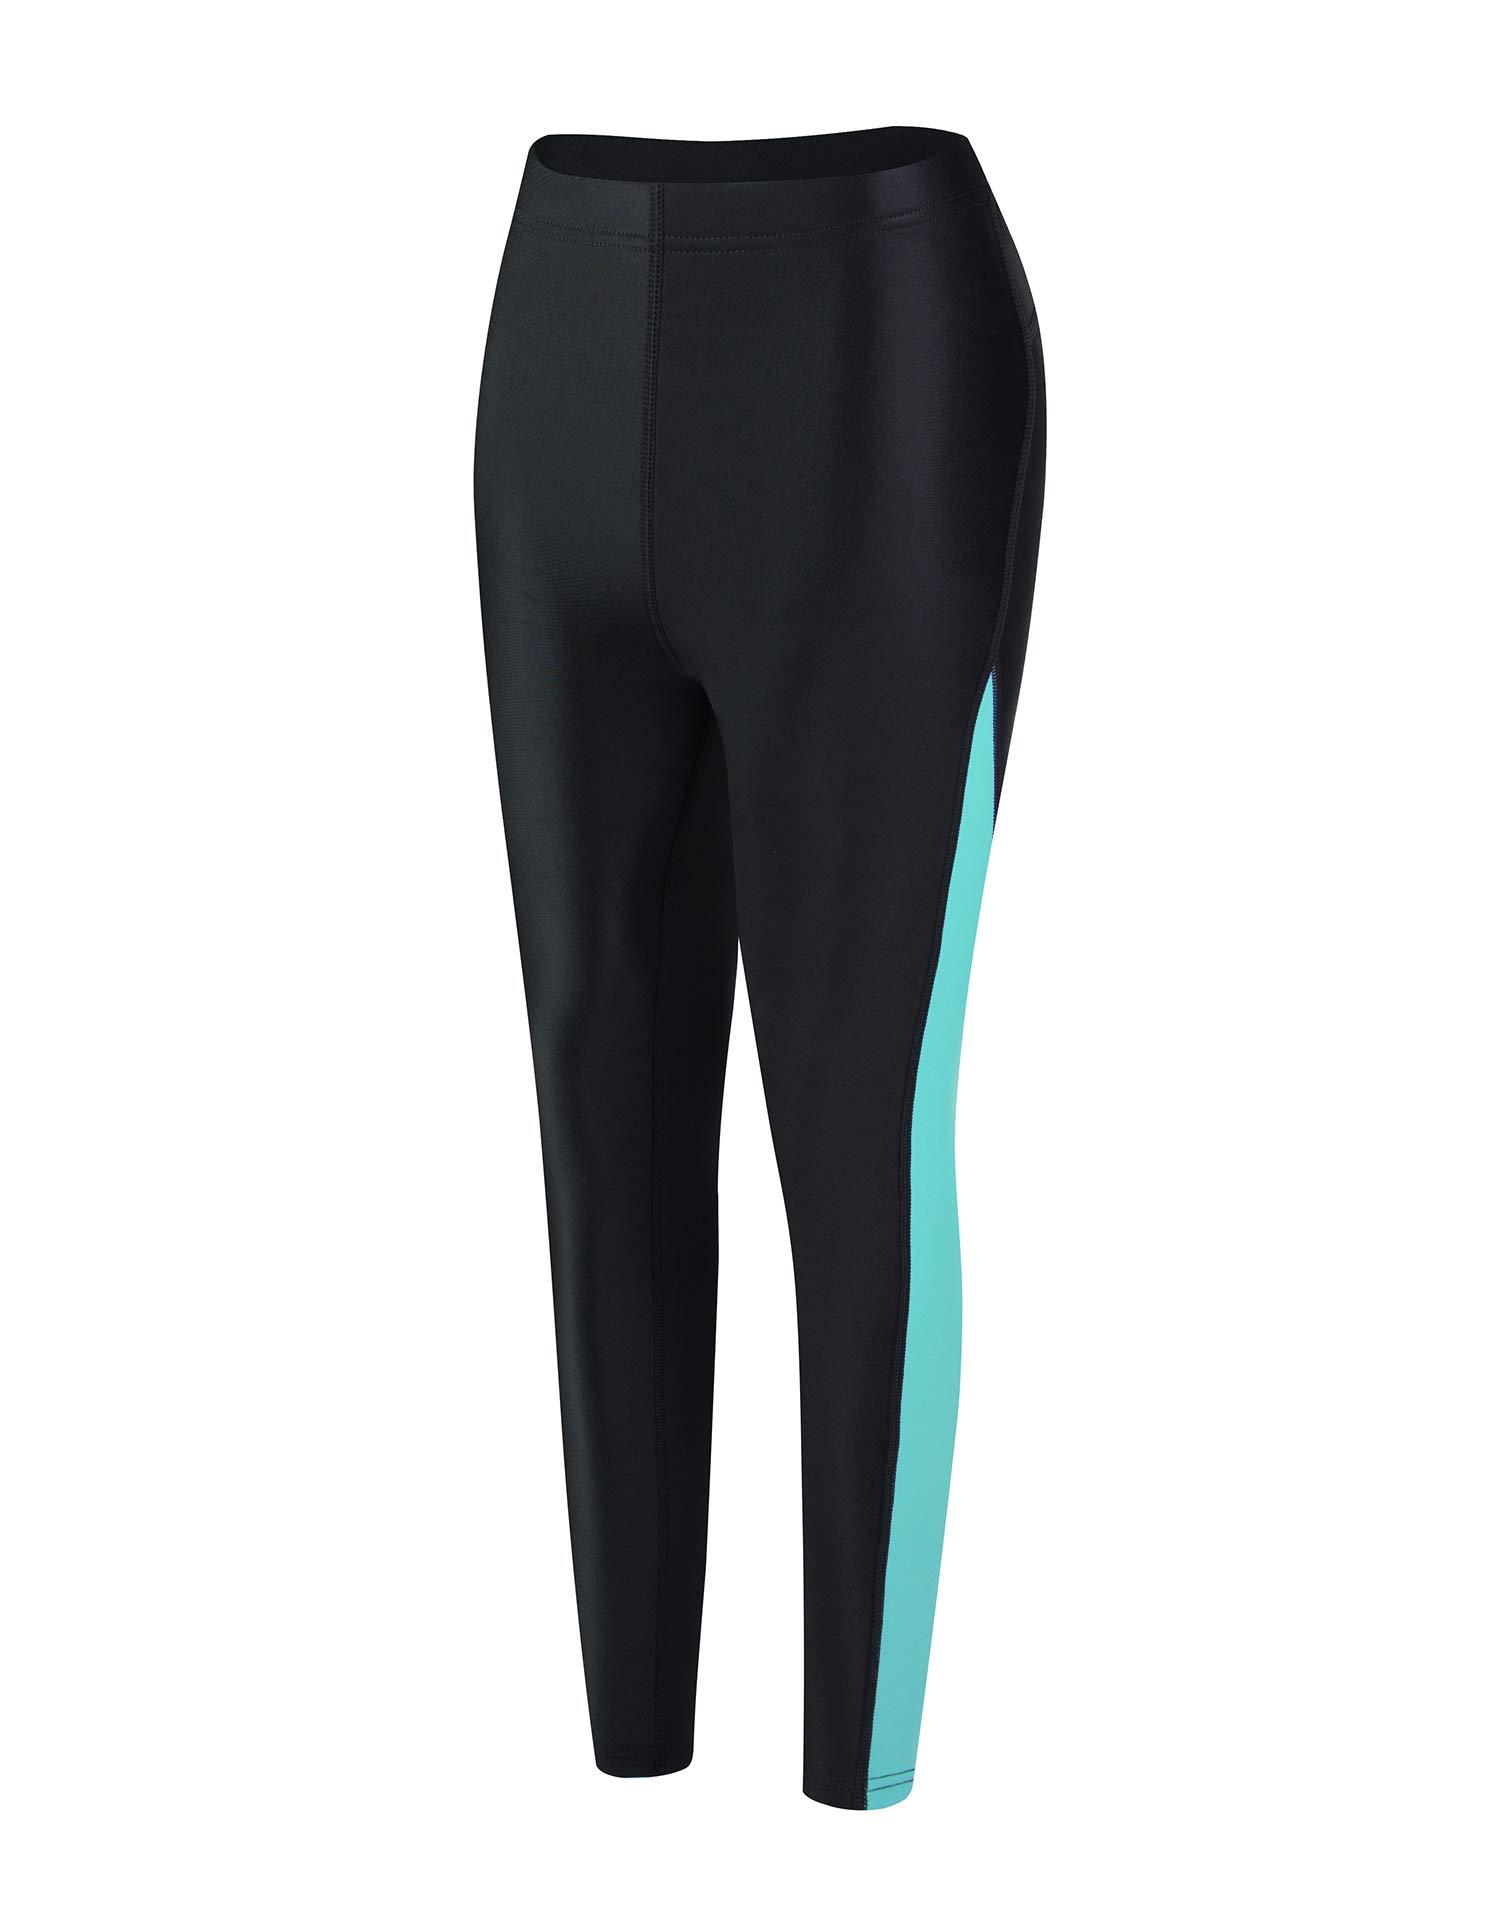 EYCE Dive & SAIL Women's 1.5mm Neoprene Wetsuit Pants Diving Snorkeling Scuba Surf Canoe Pants (Blue, XLarge) by EYCE